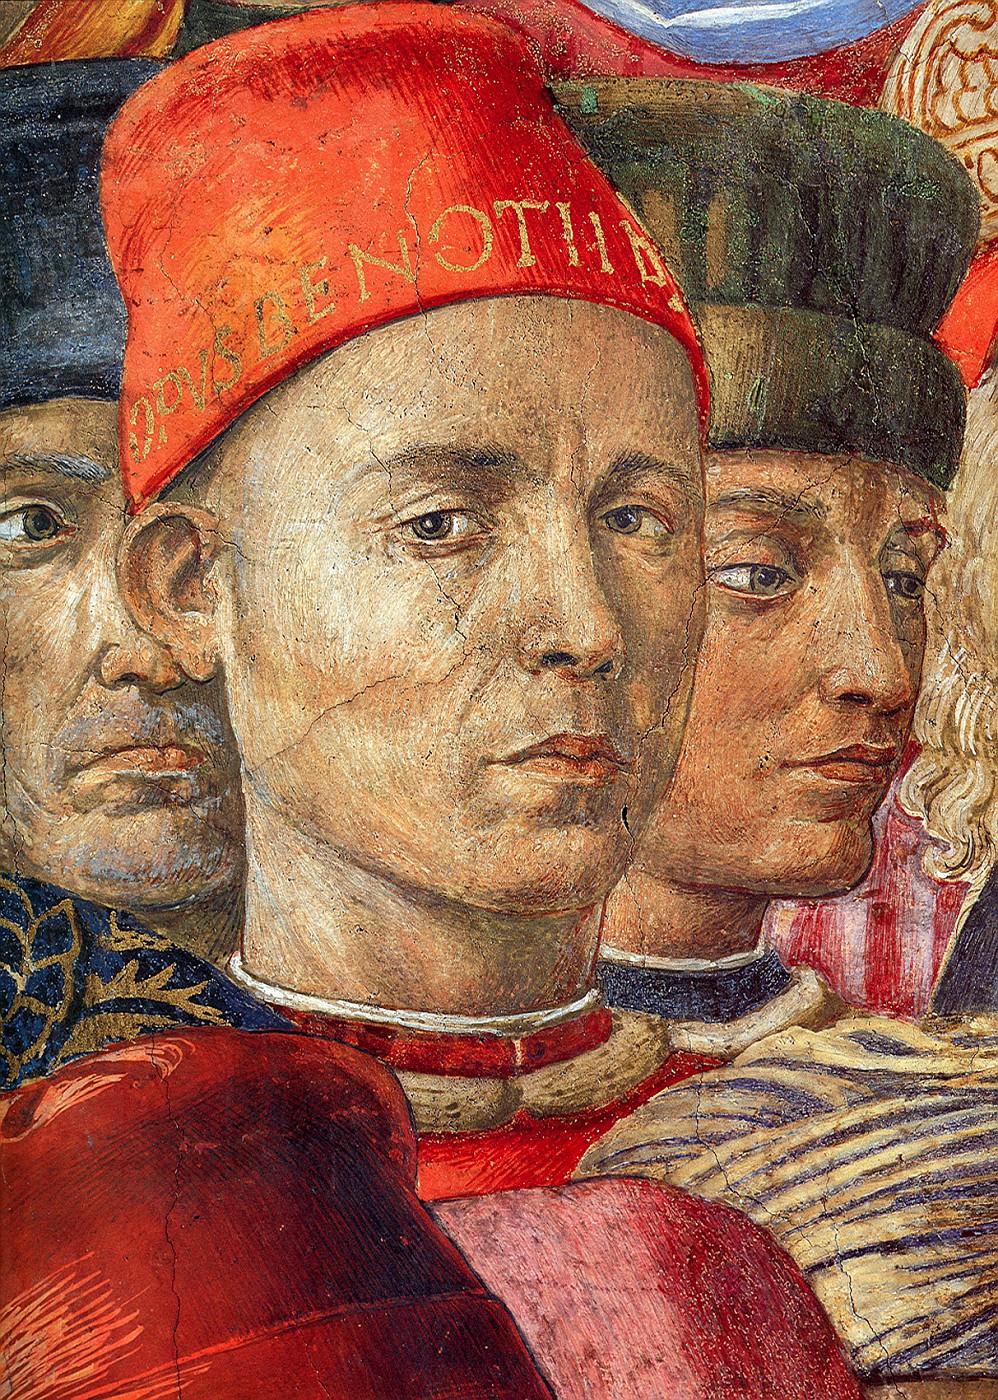 Беноццо Гоццоли (итал. Benozzo Gozzoli, 1420—1497) — итальянский художник